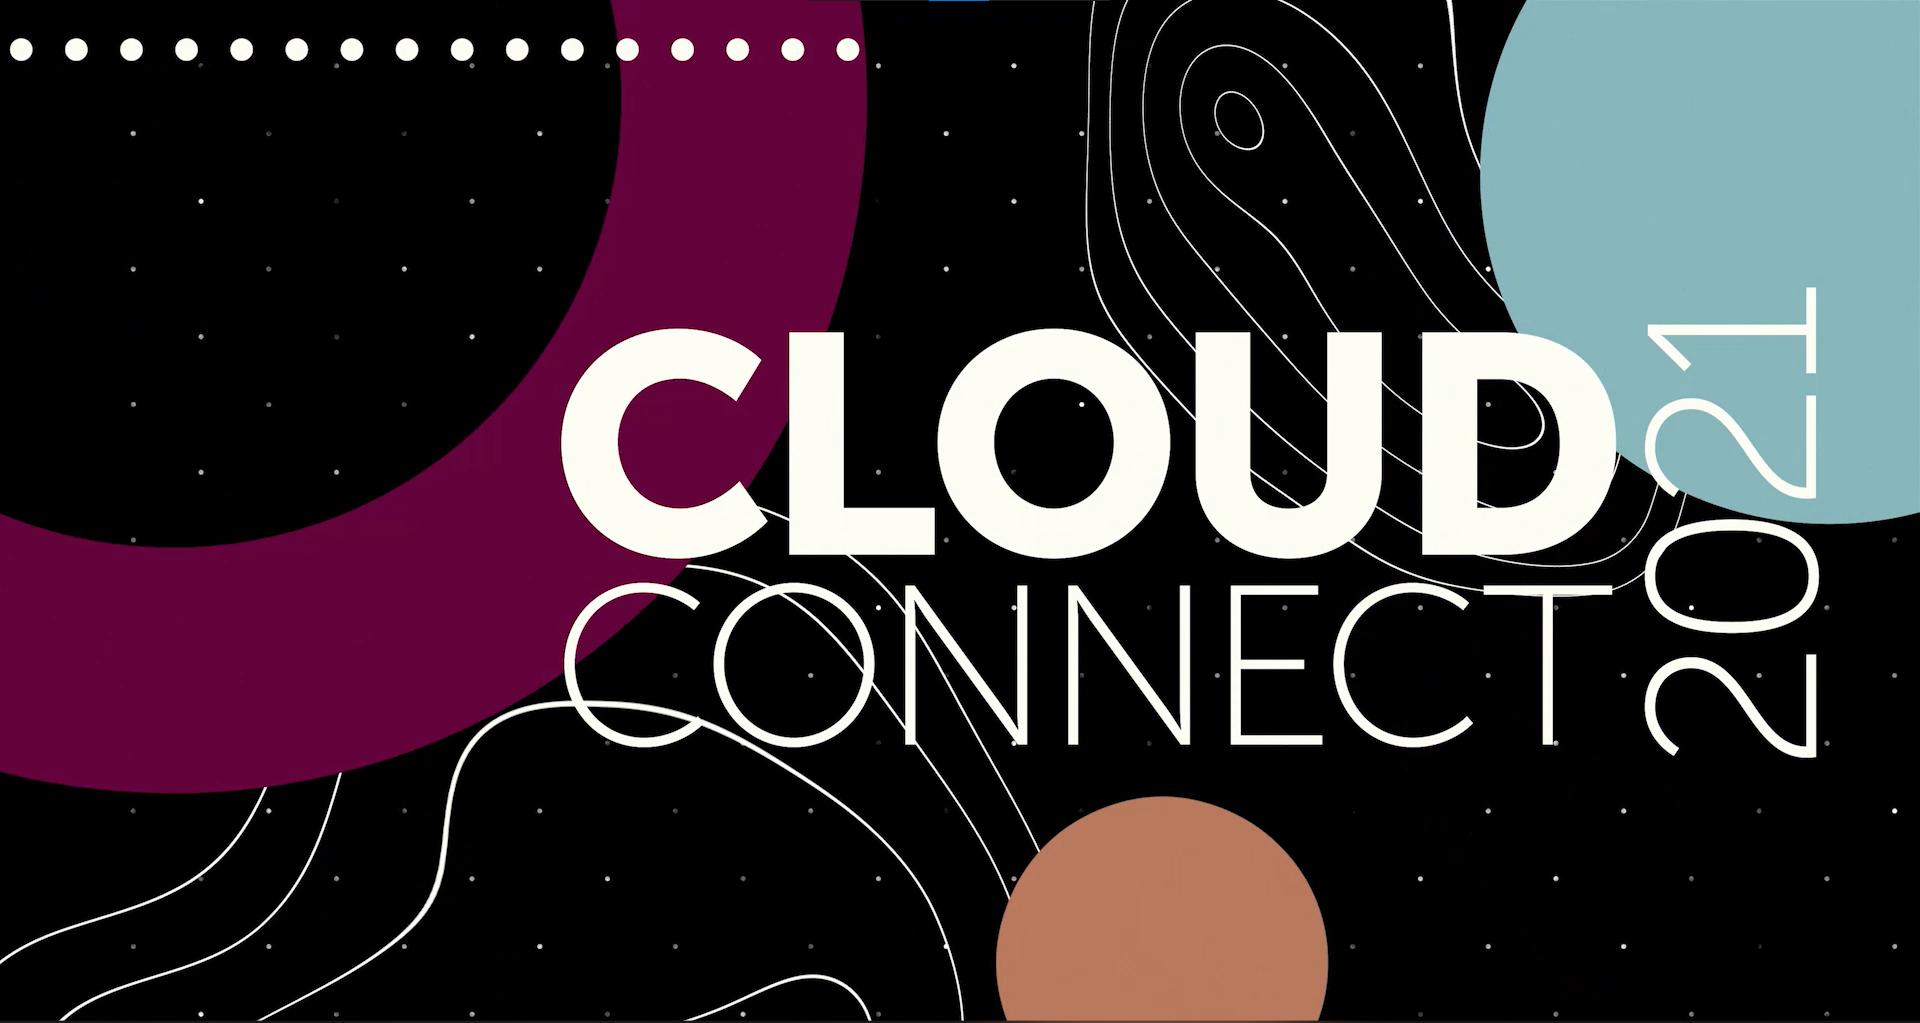 Cloud Connect zaproszenie Final bez bloopers